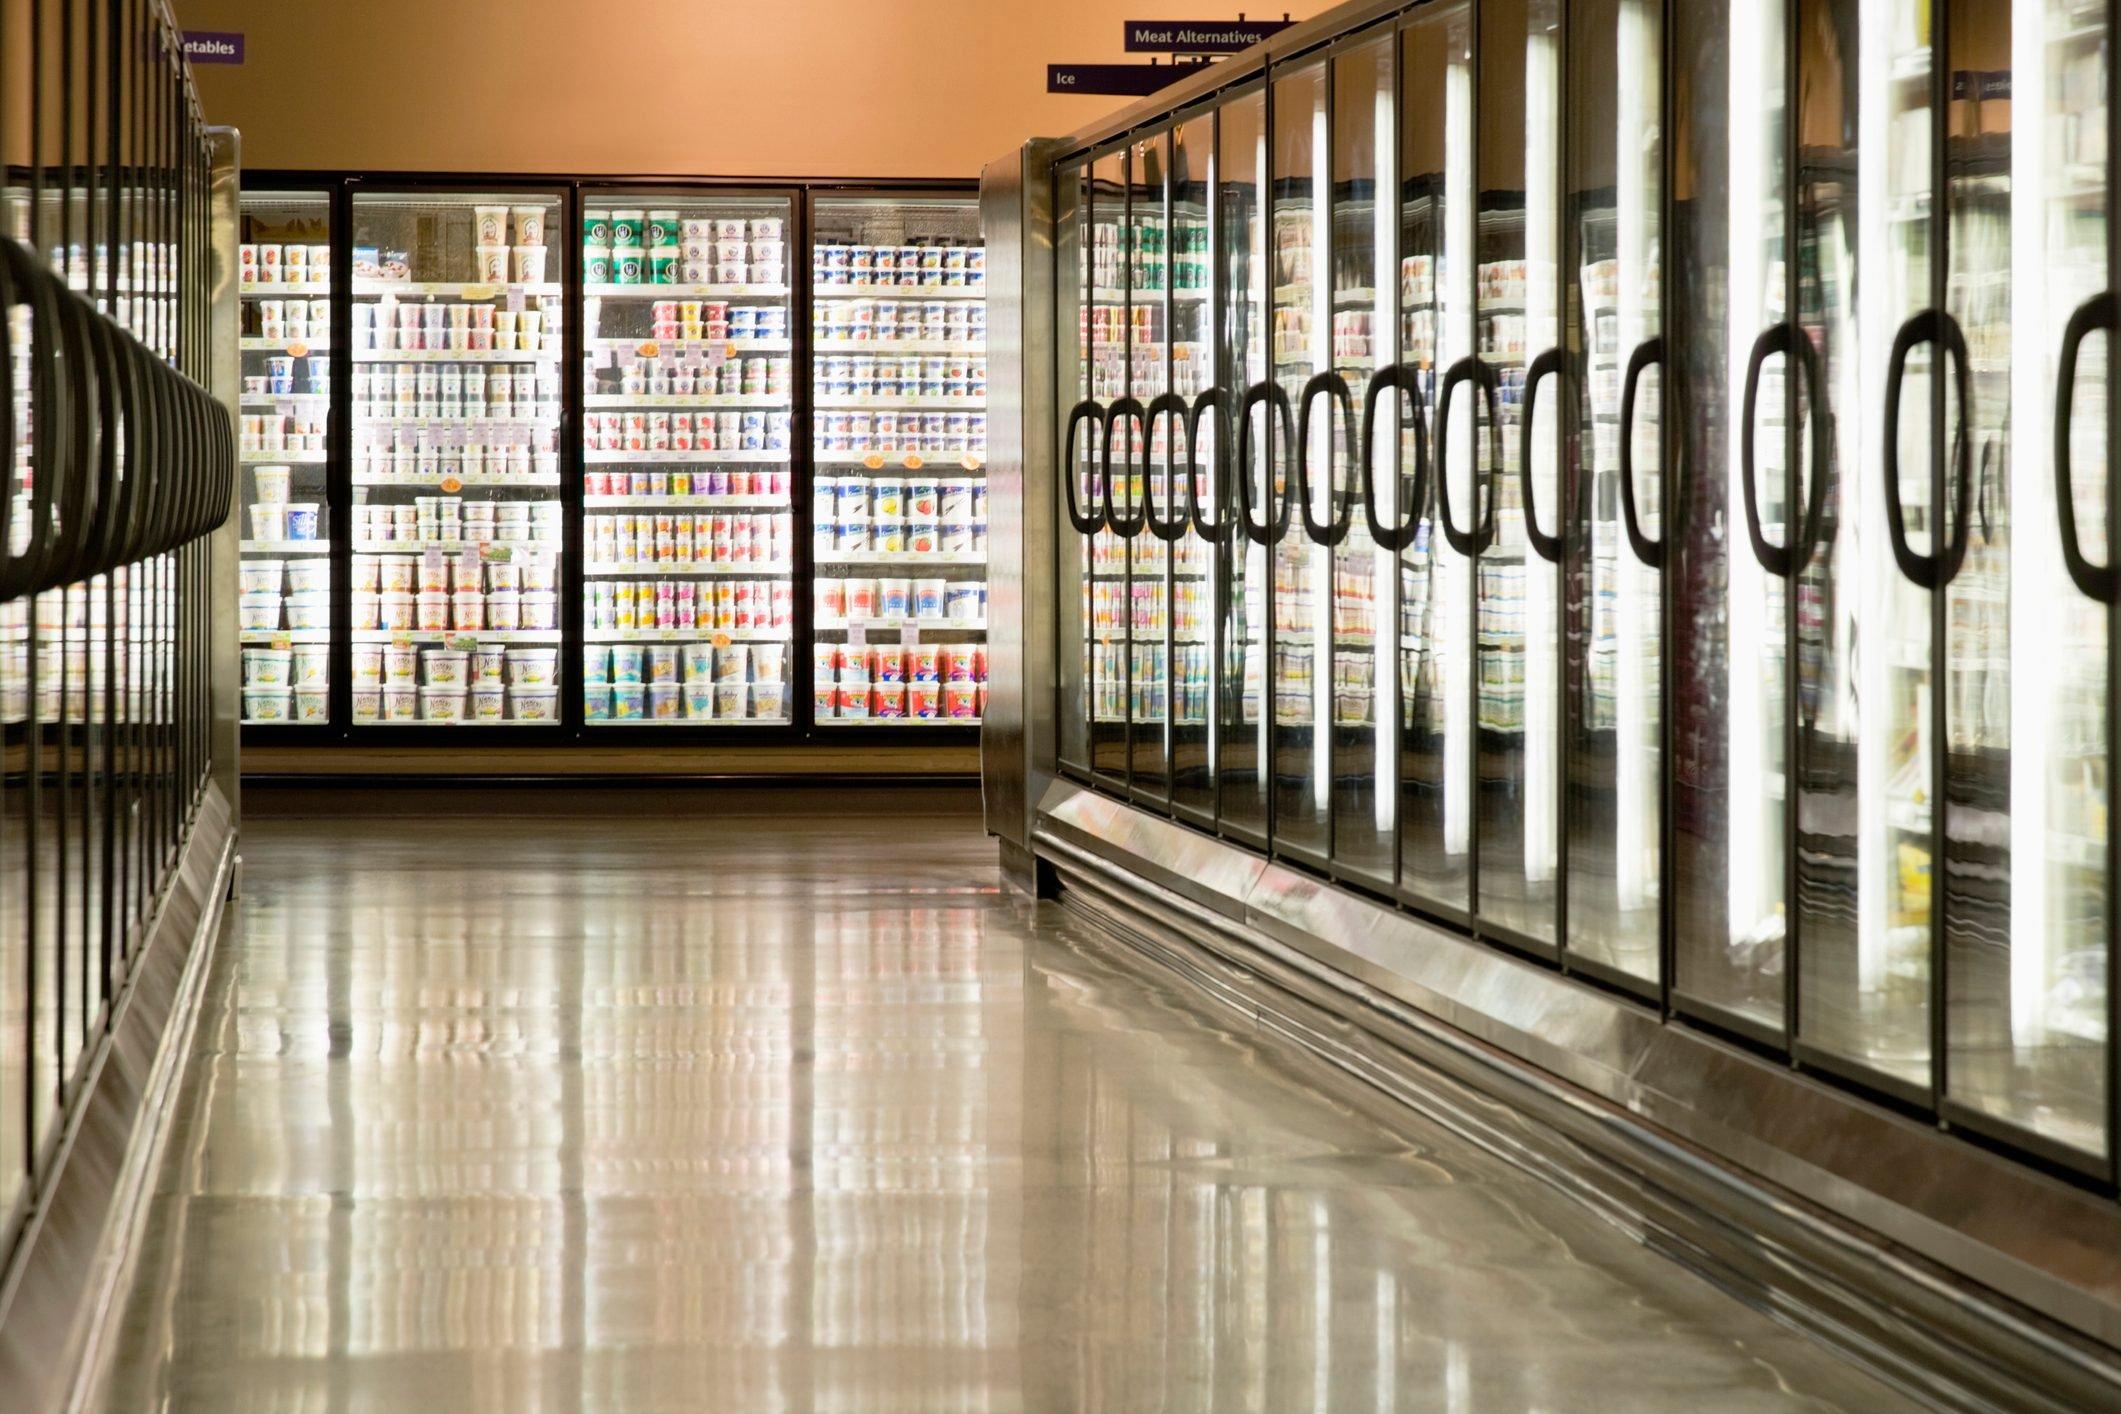 Freezer cases in supermarket